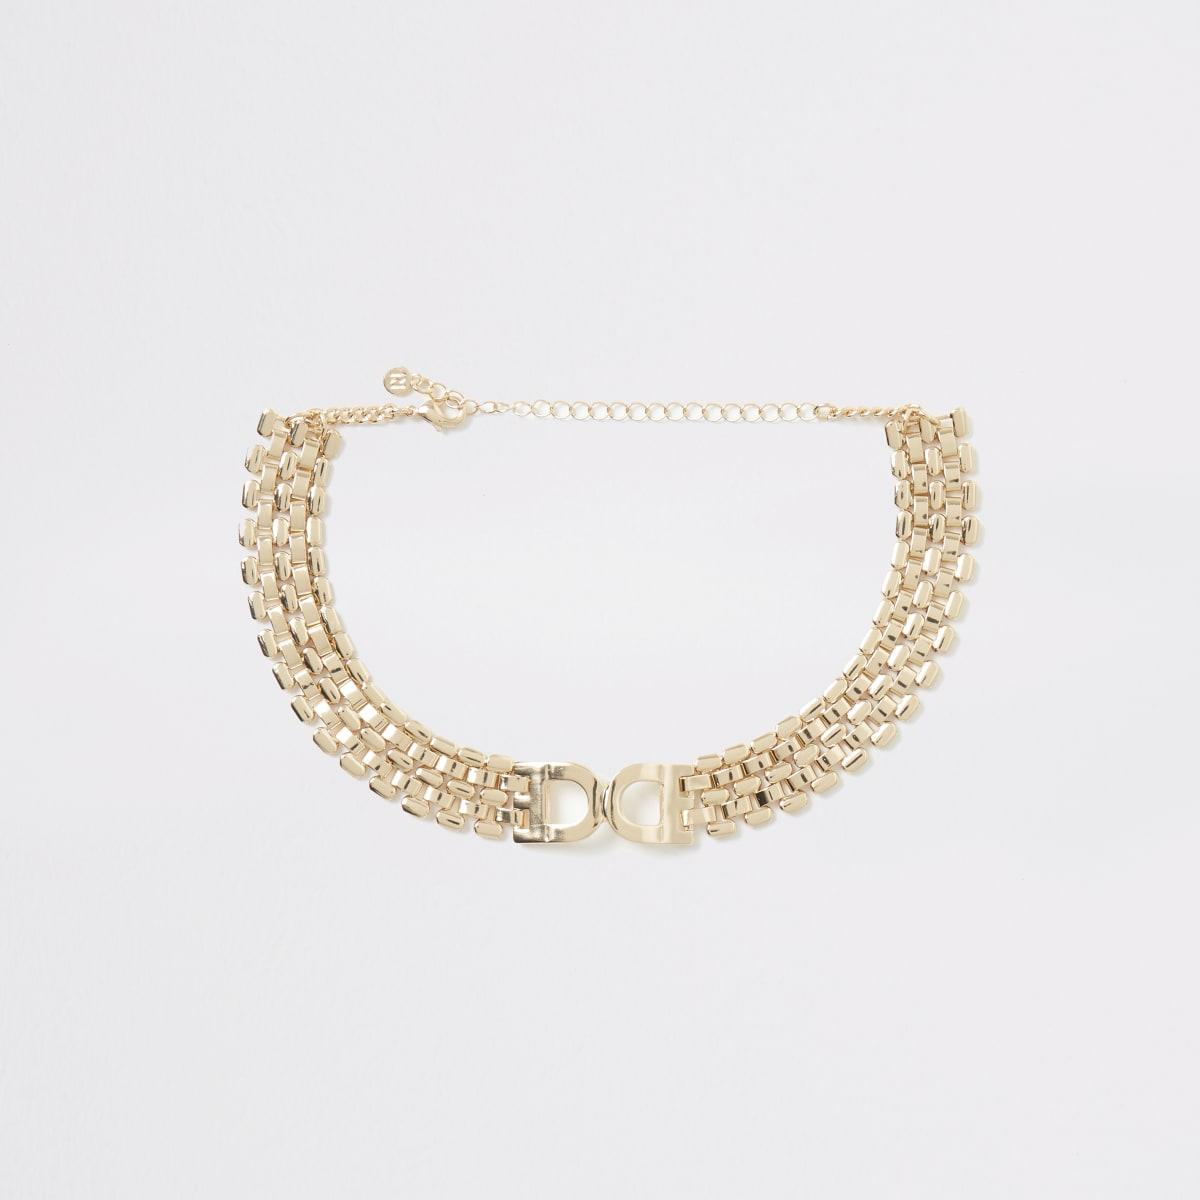 Gold colour D ring choker